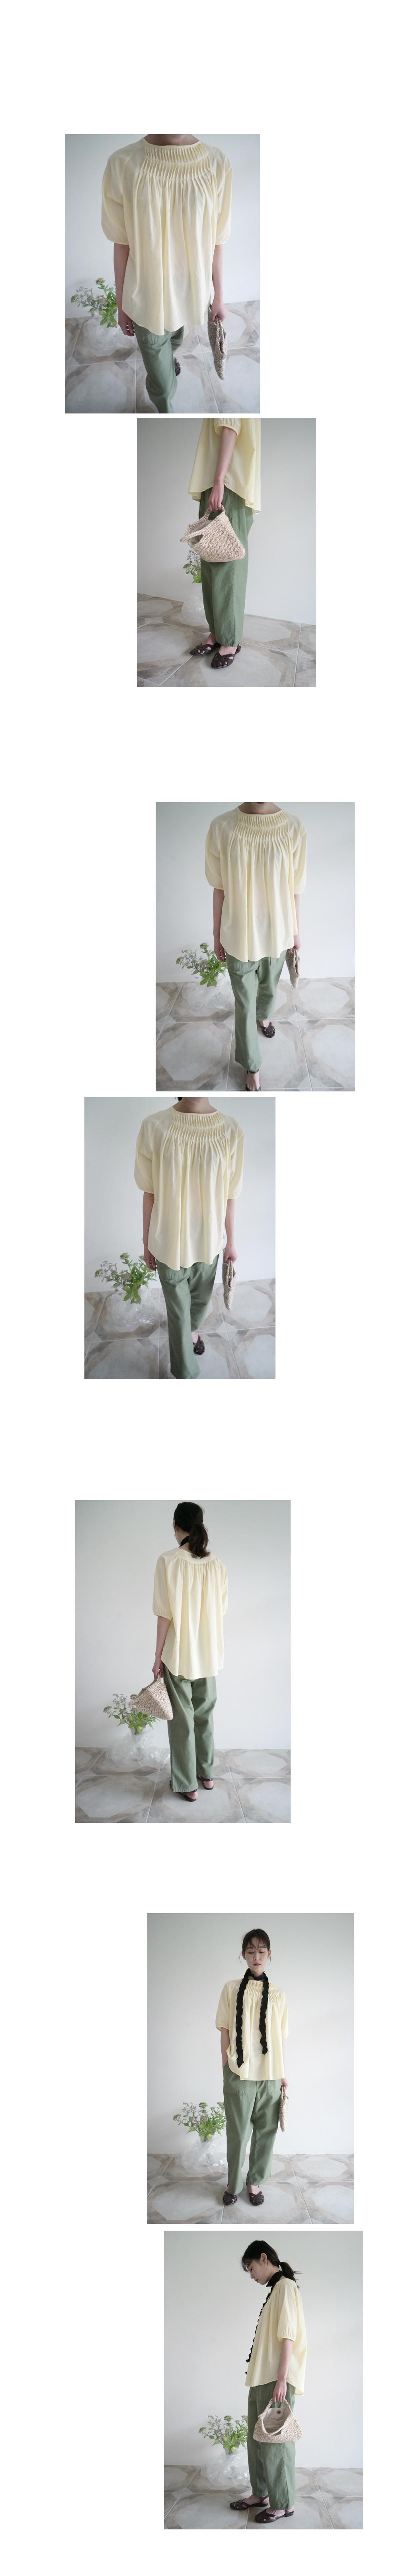 hyaline pvc bag (2colors)